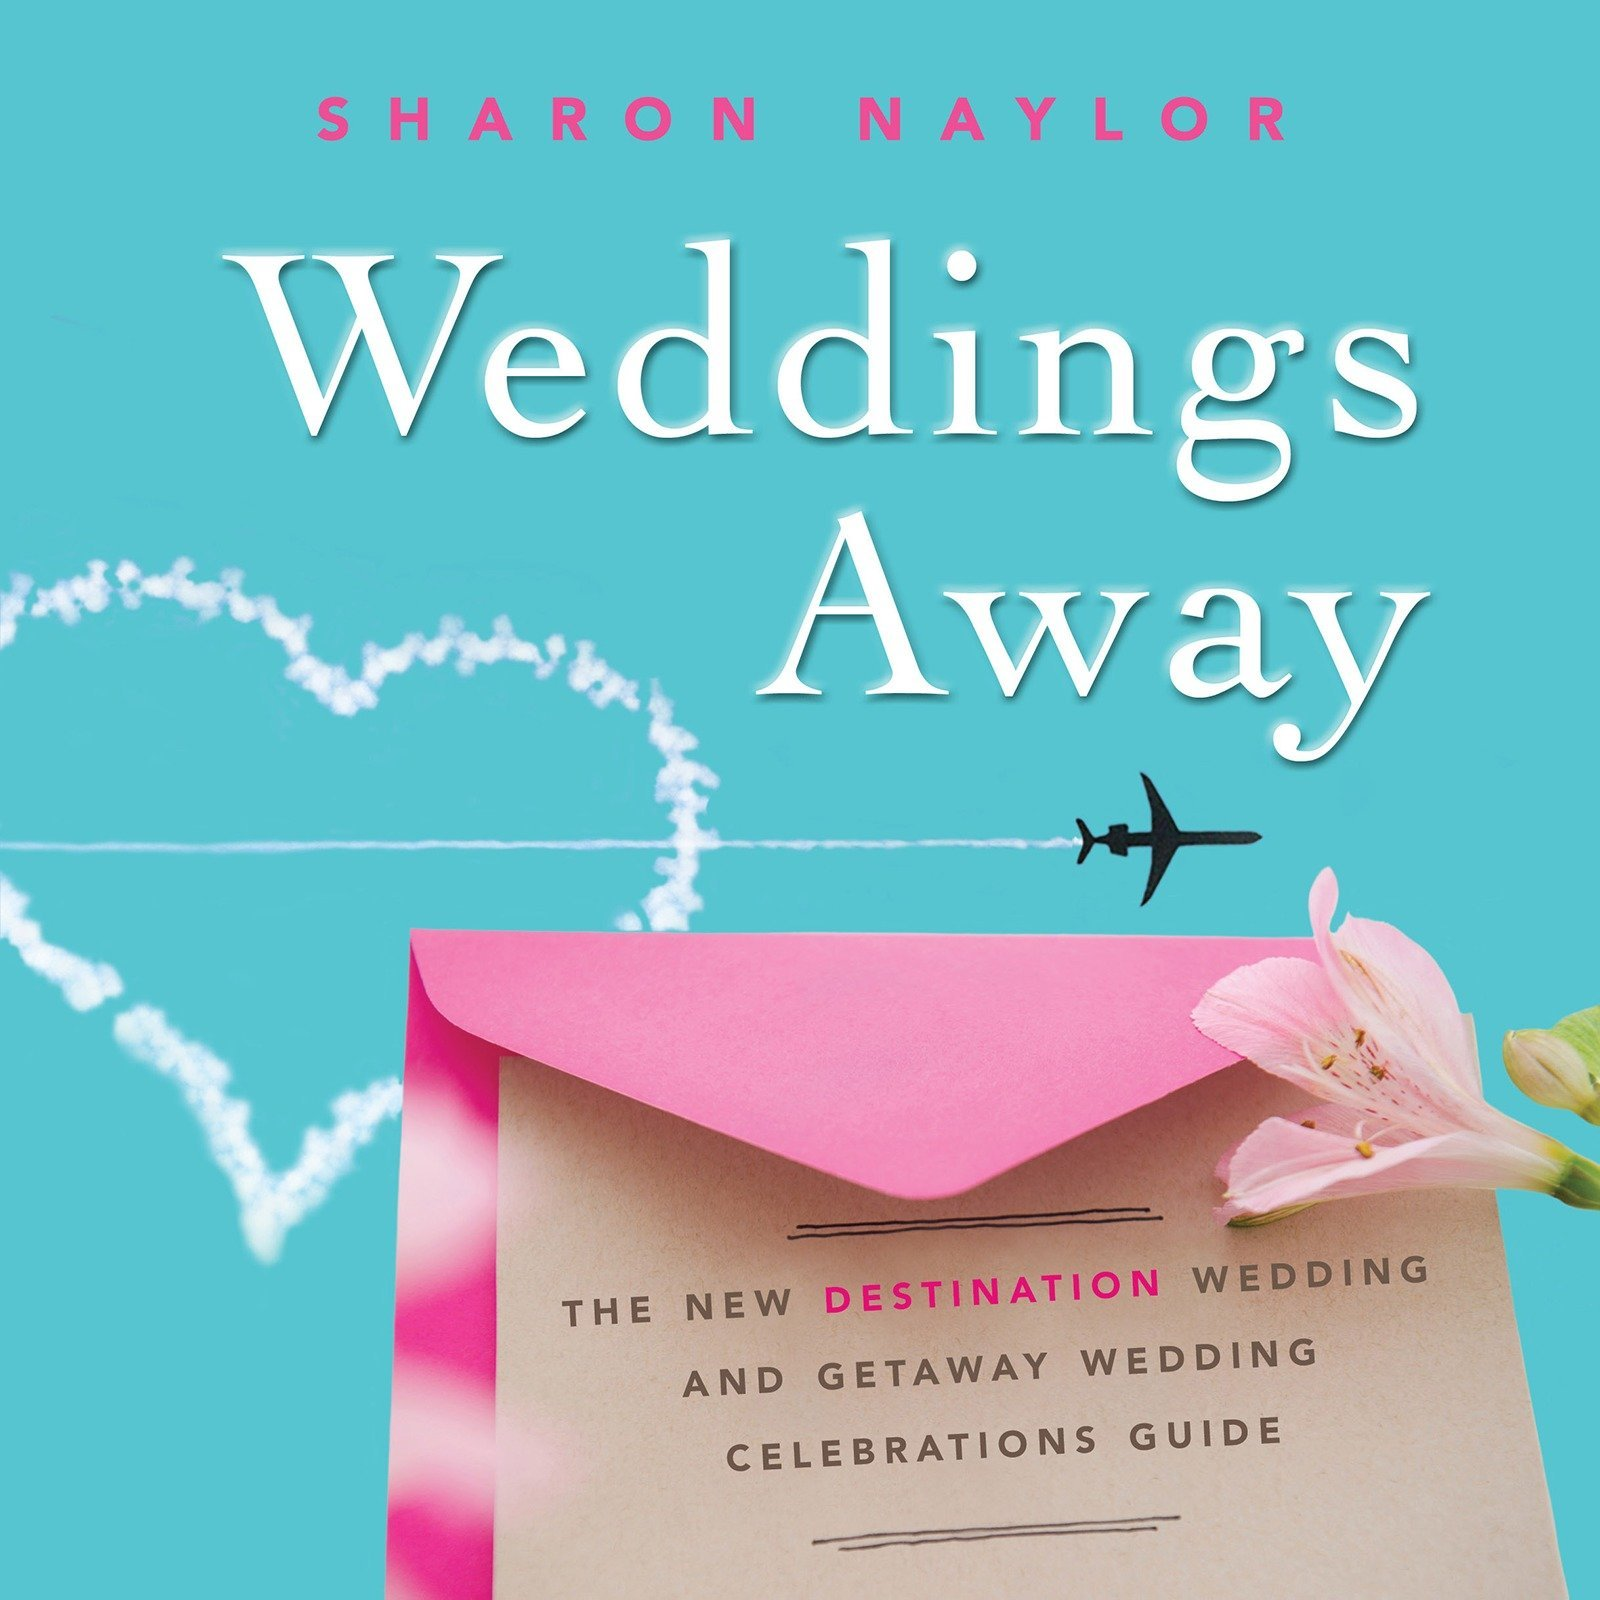 Weddings Away: The New Destination Wedding and Getaway Wedding Celebrations Guide